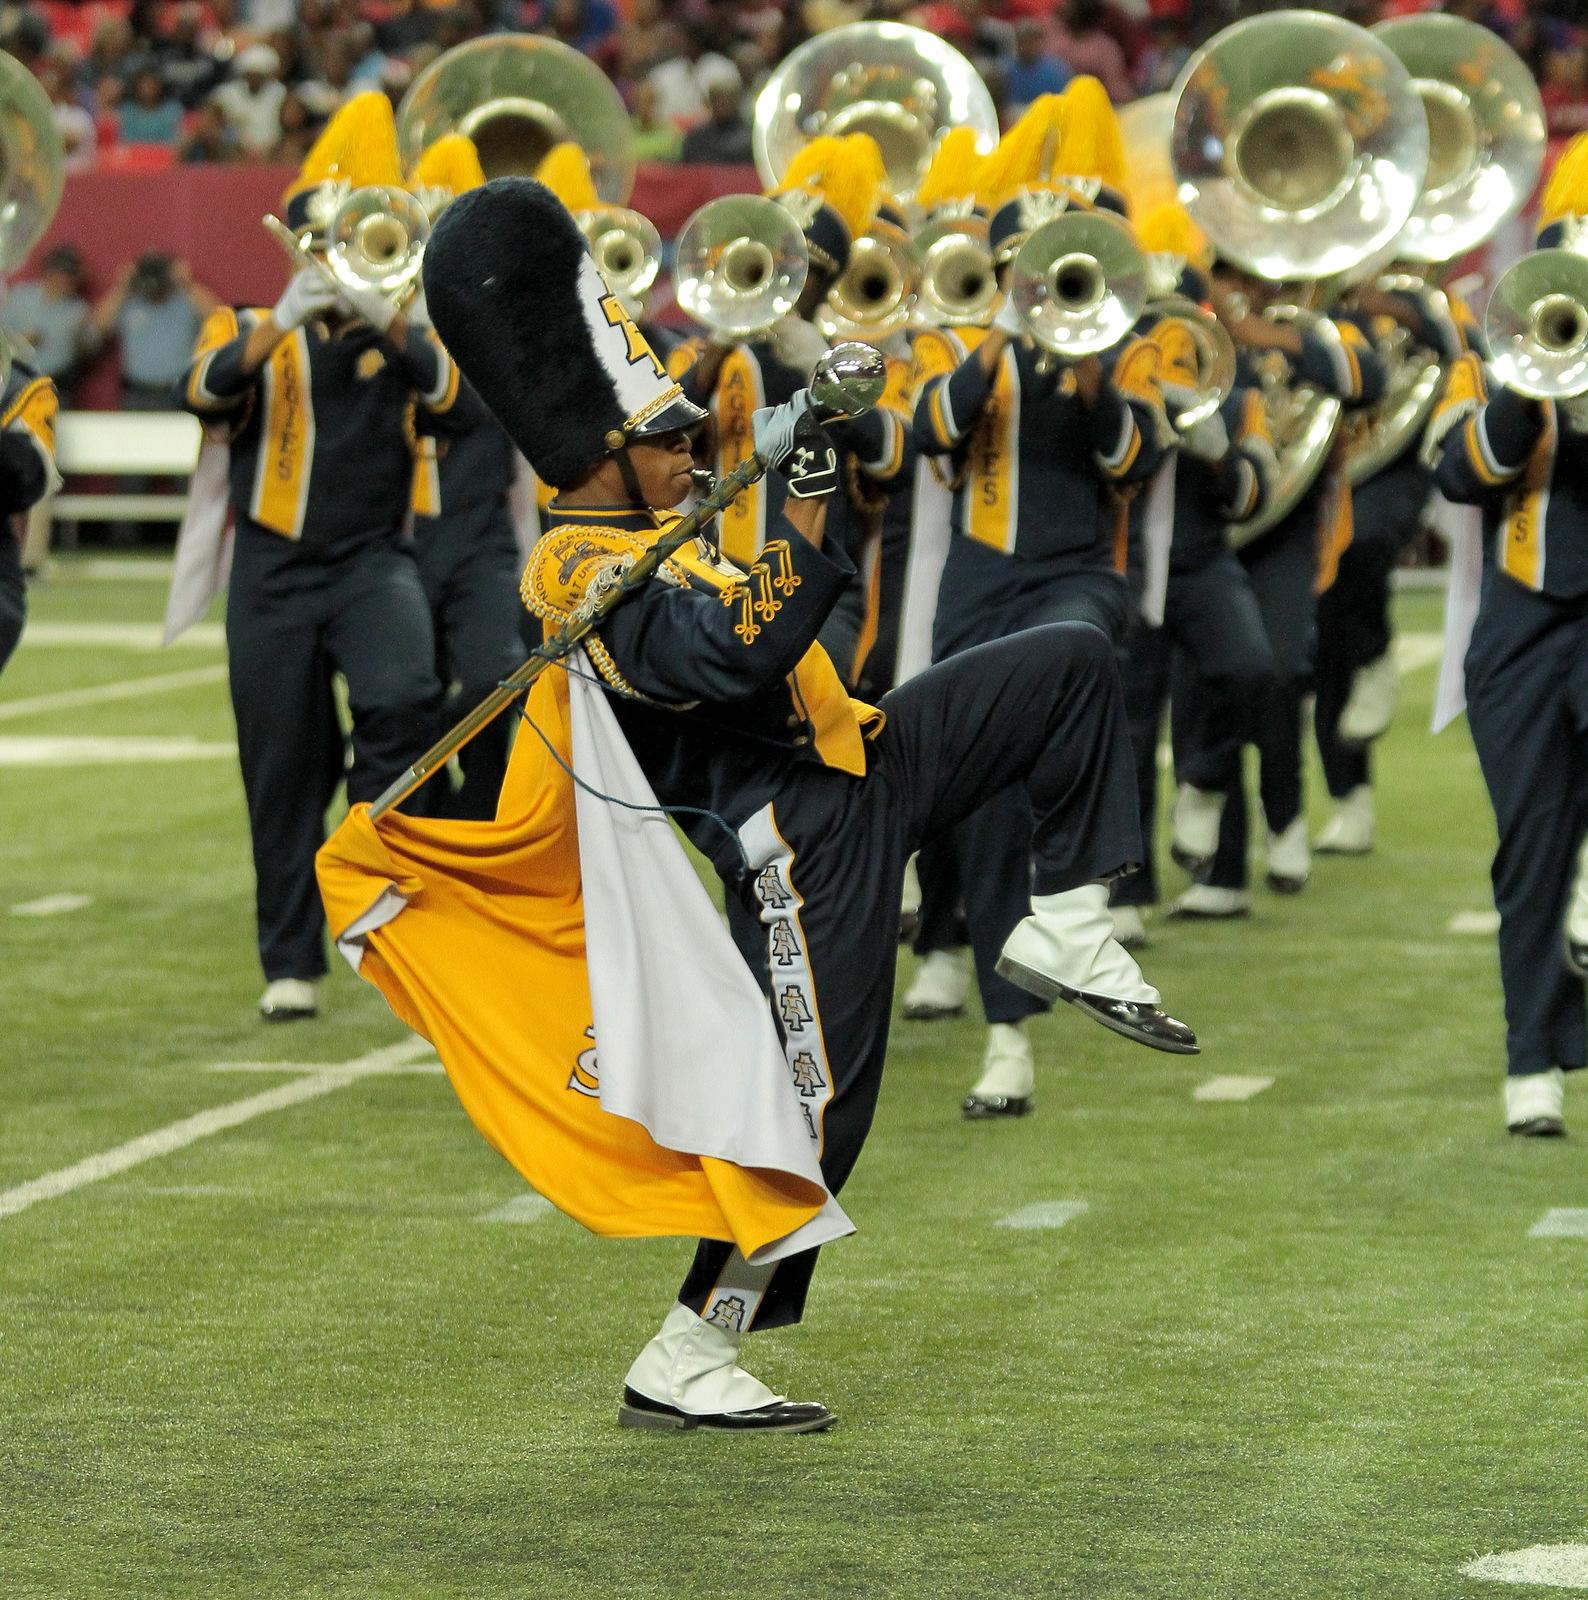 North Carolina A&T drum major and marching band p...